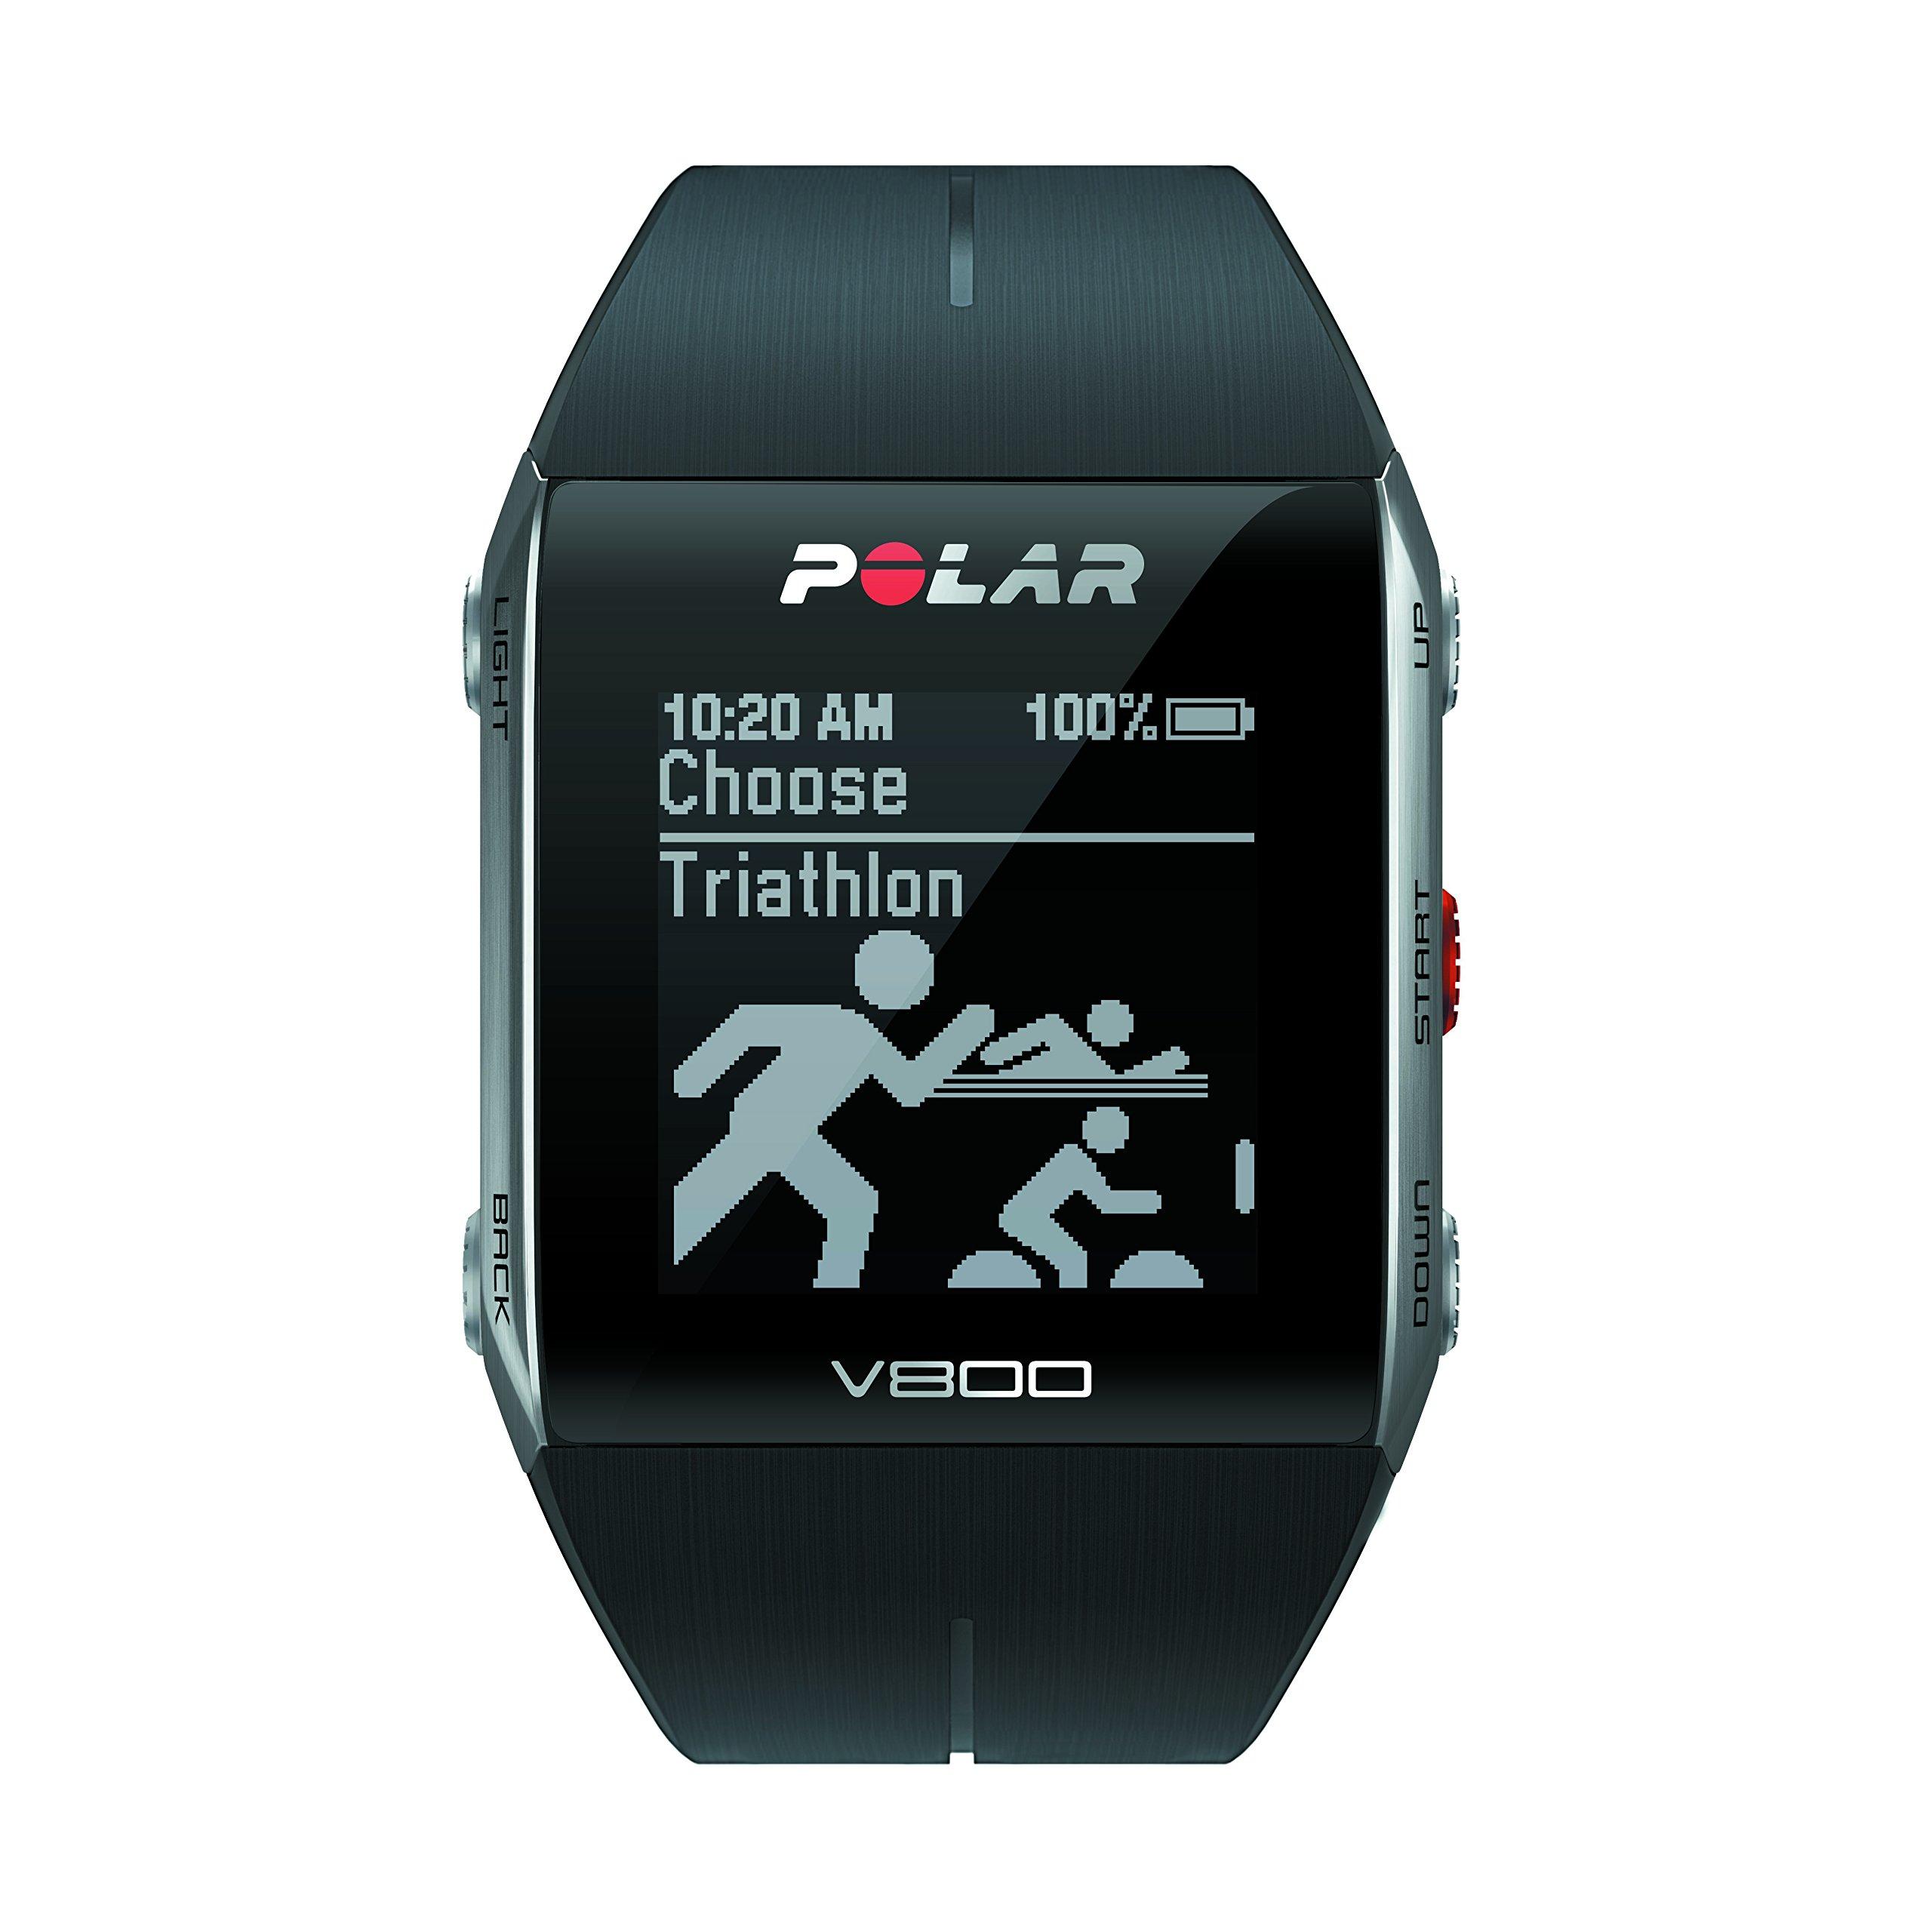 Polar V800 Cardiofrequenzimetro senza Sensore di Frequenza Cardiaca, Nero product image